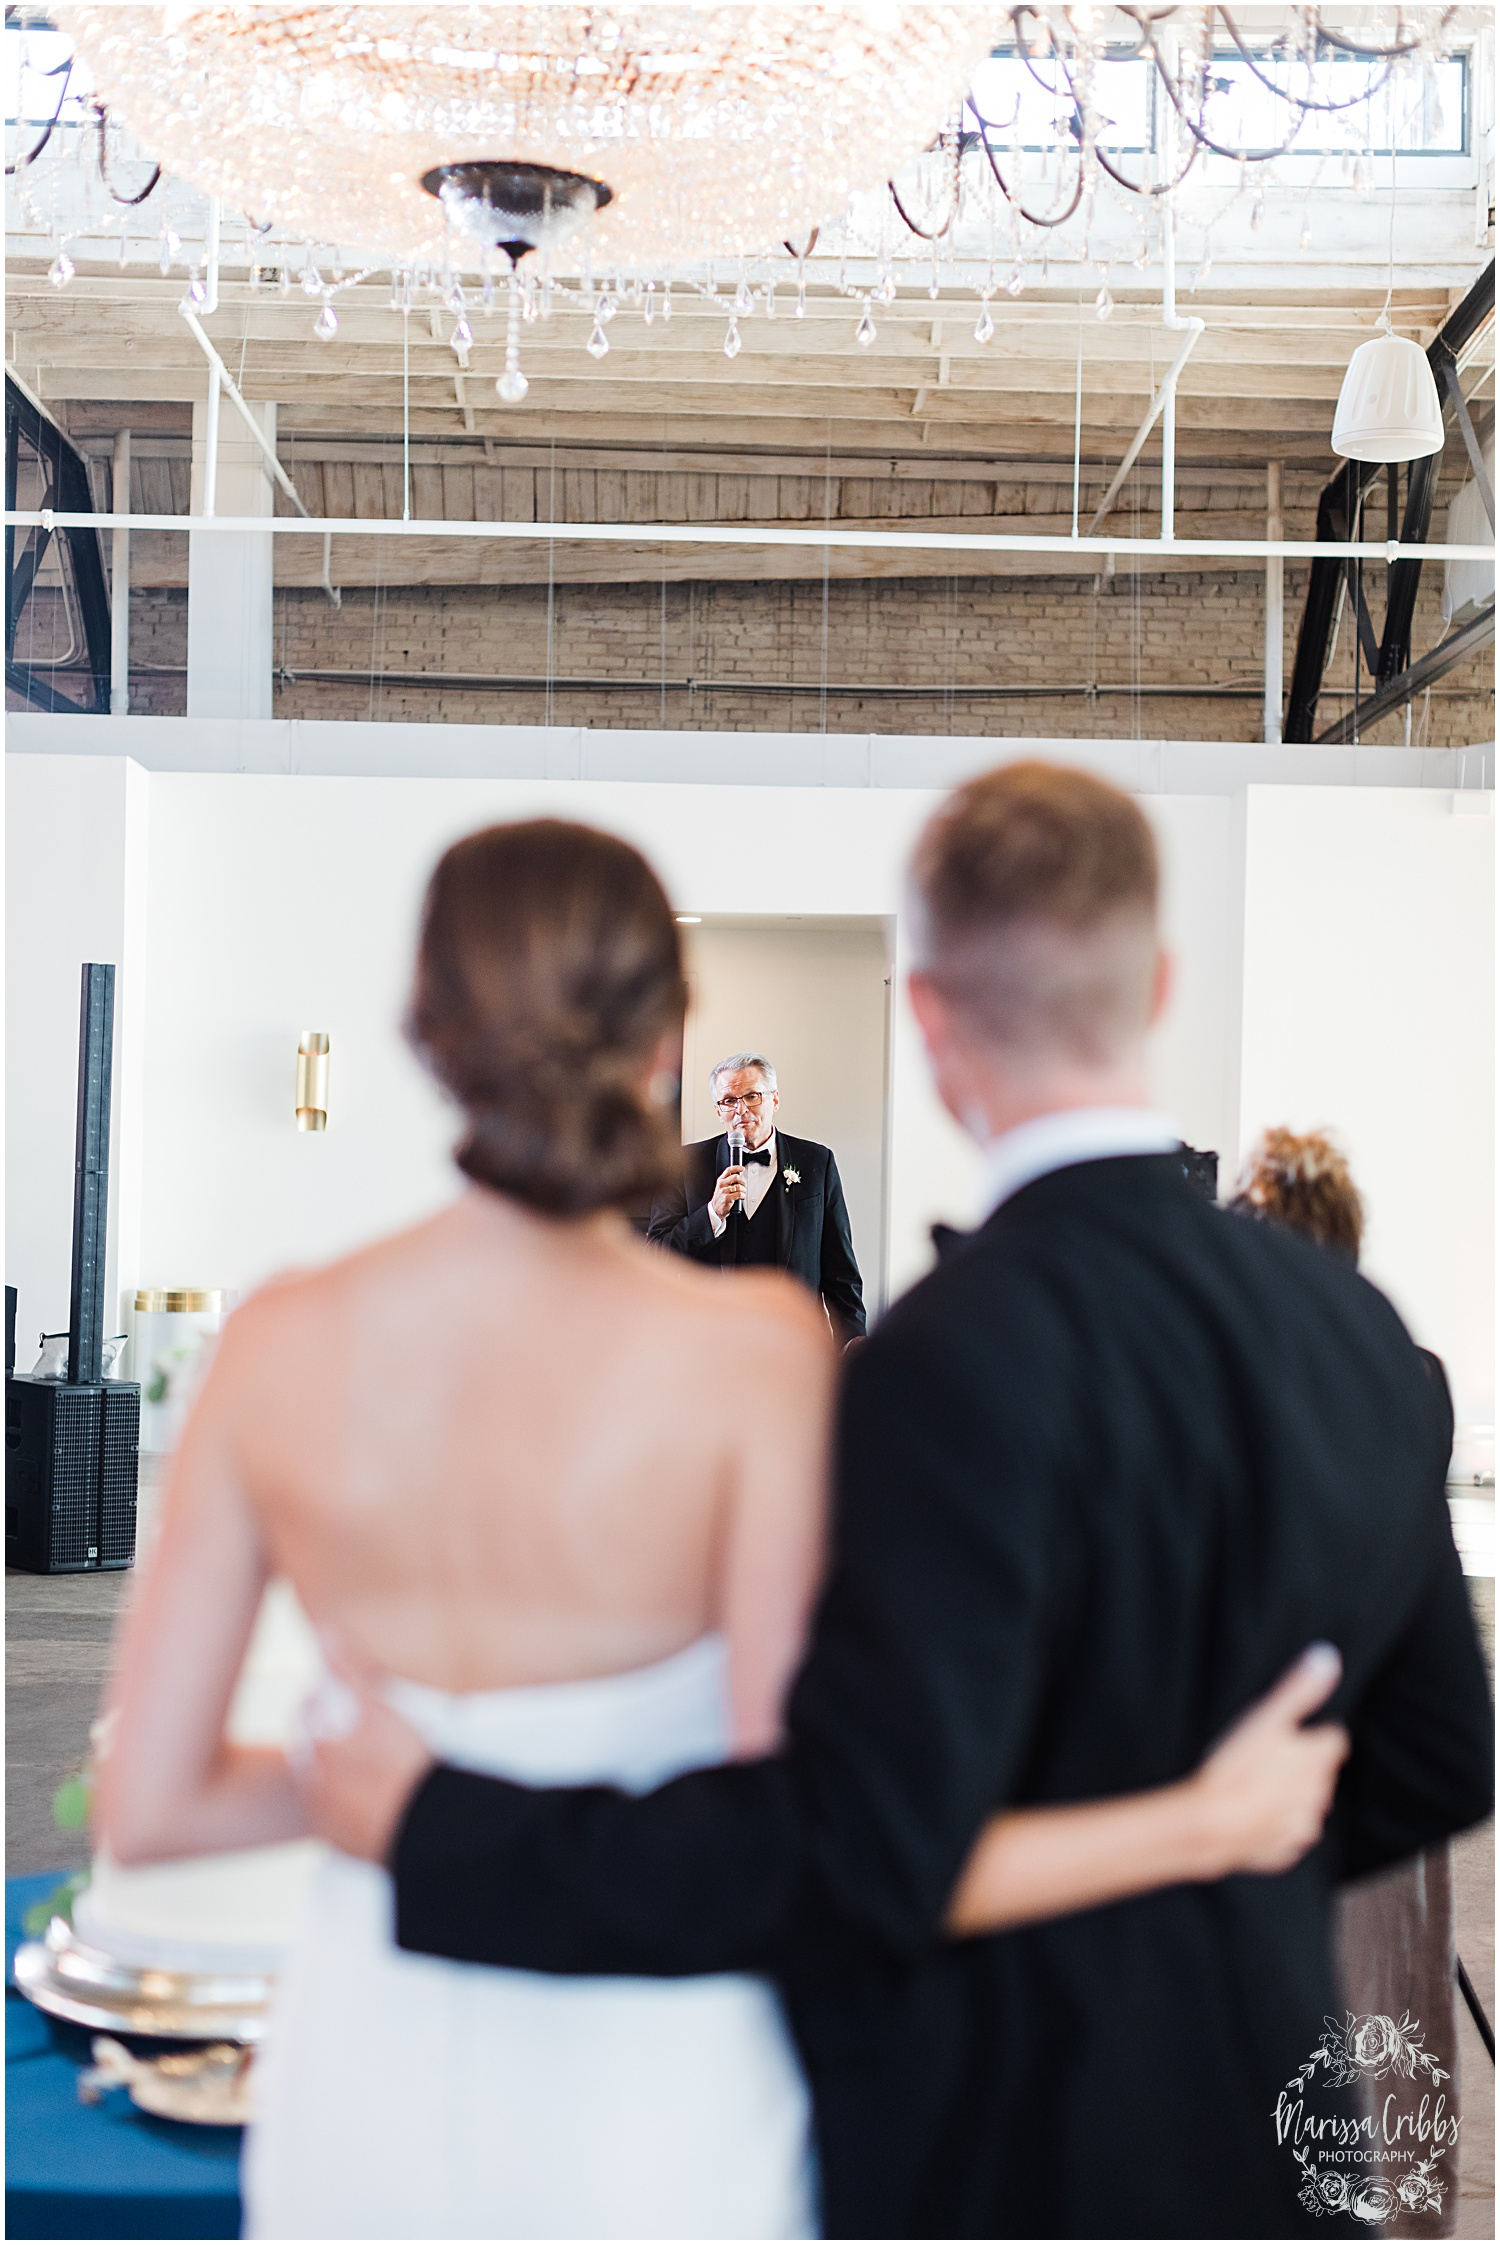 JOANNE & GEORGE MARRIED BLOG | MARISSA CRIBBS PHOTOGRAPHY | THE ABBOTT | KANSAS CITY WEDDING PHOTOS_9153.jpg